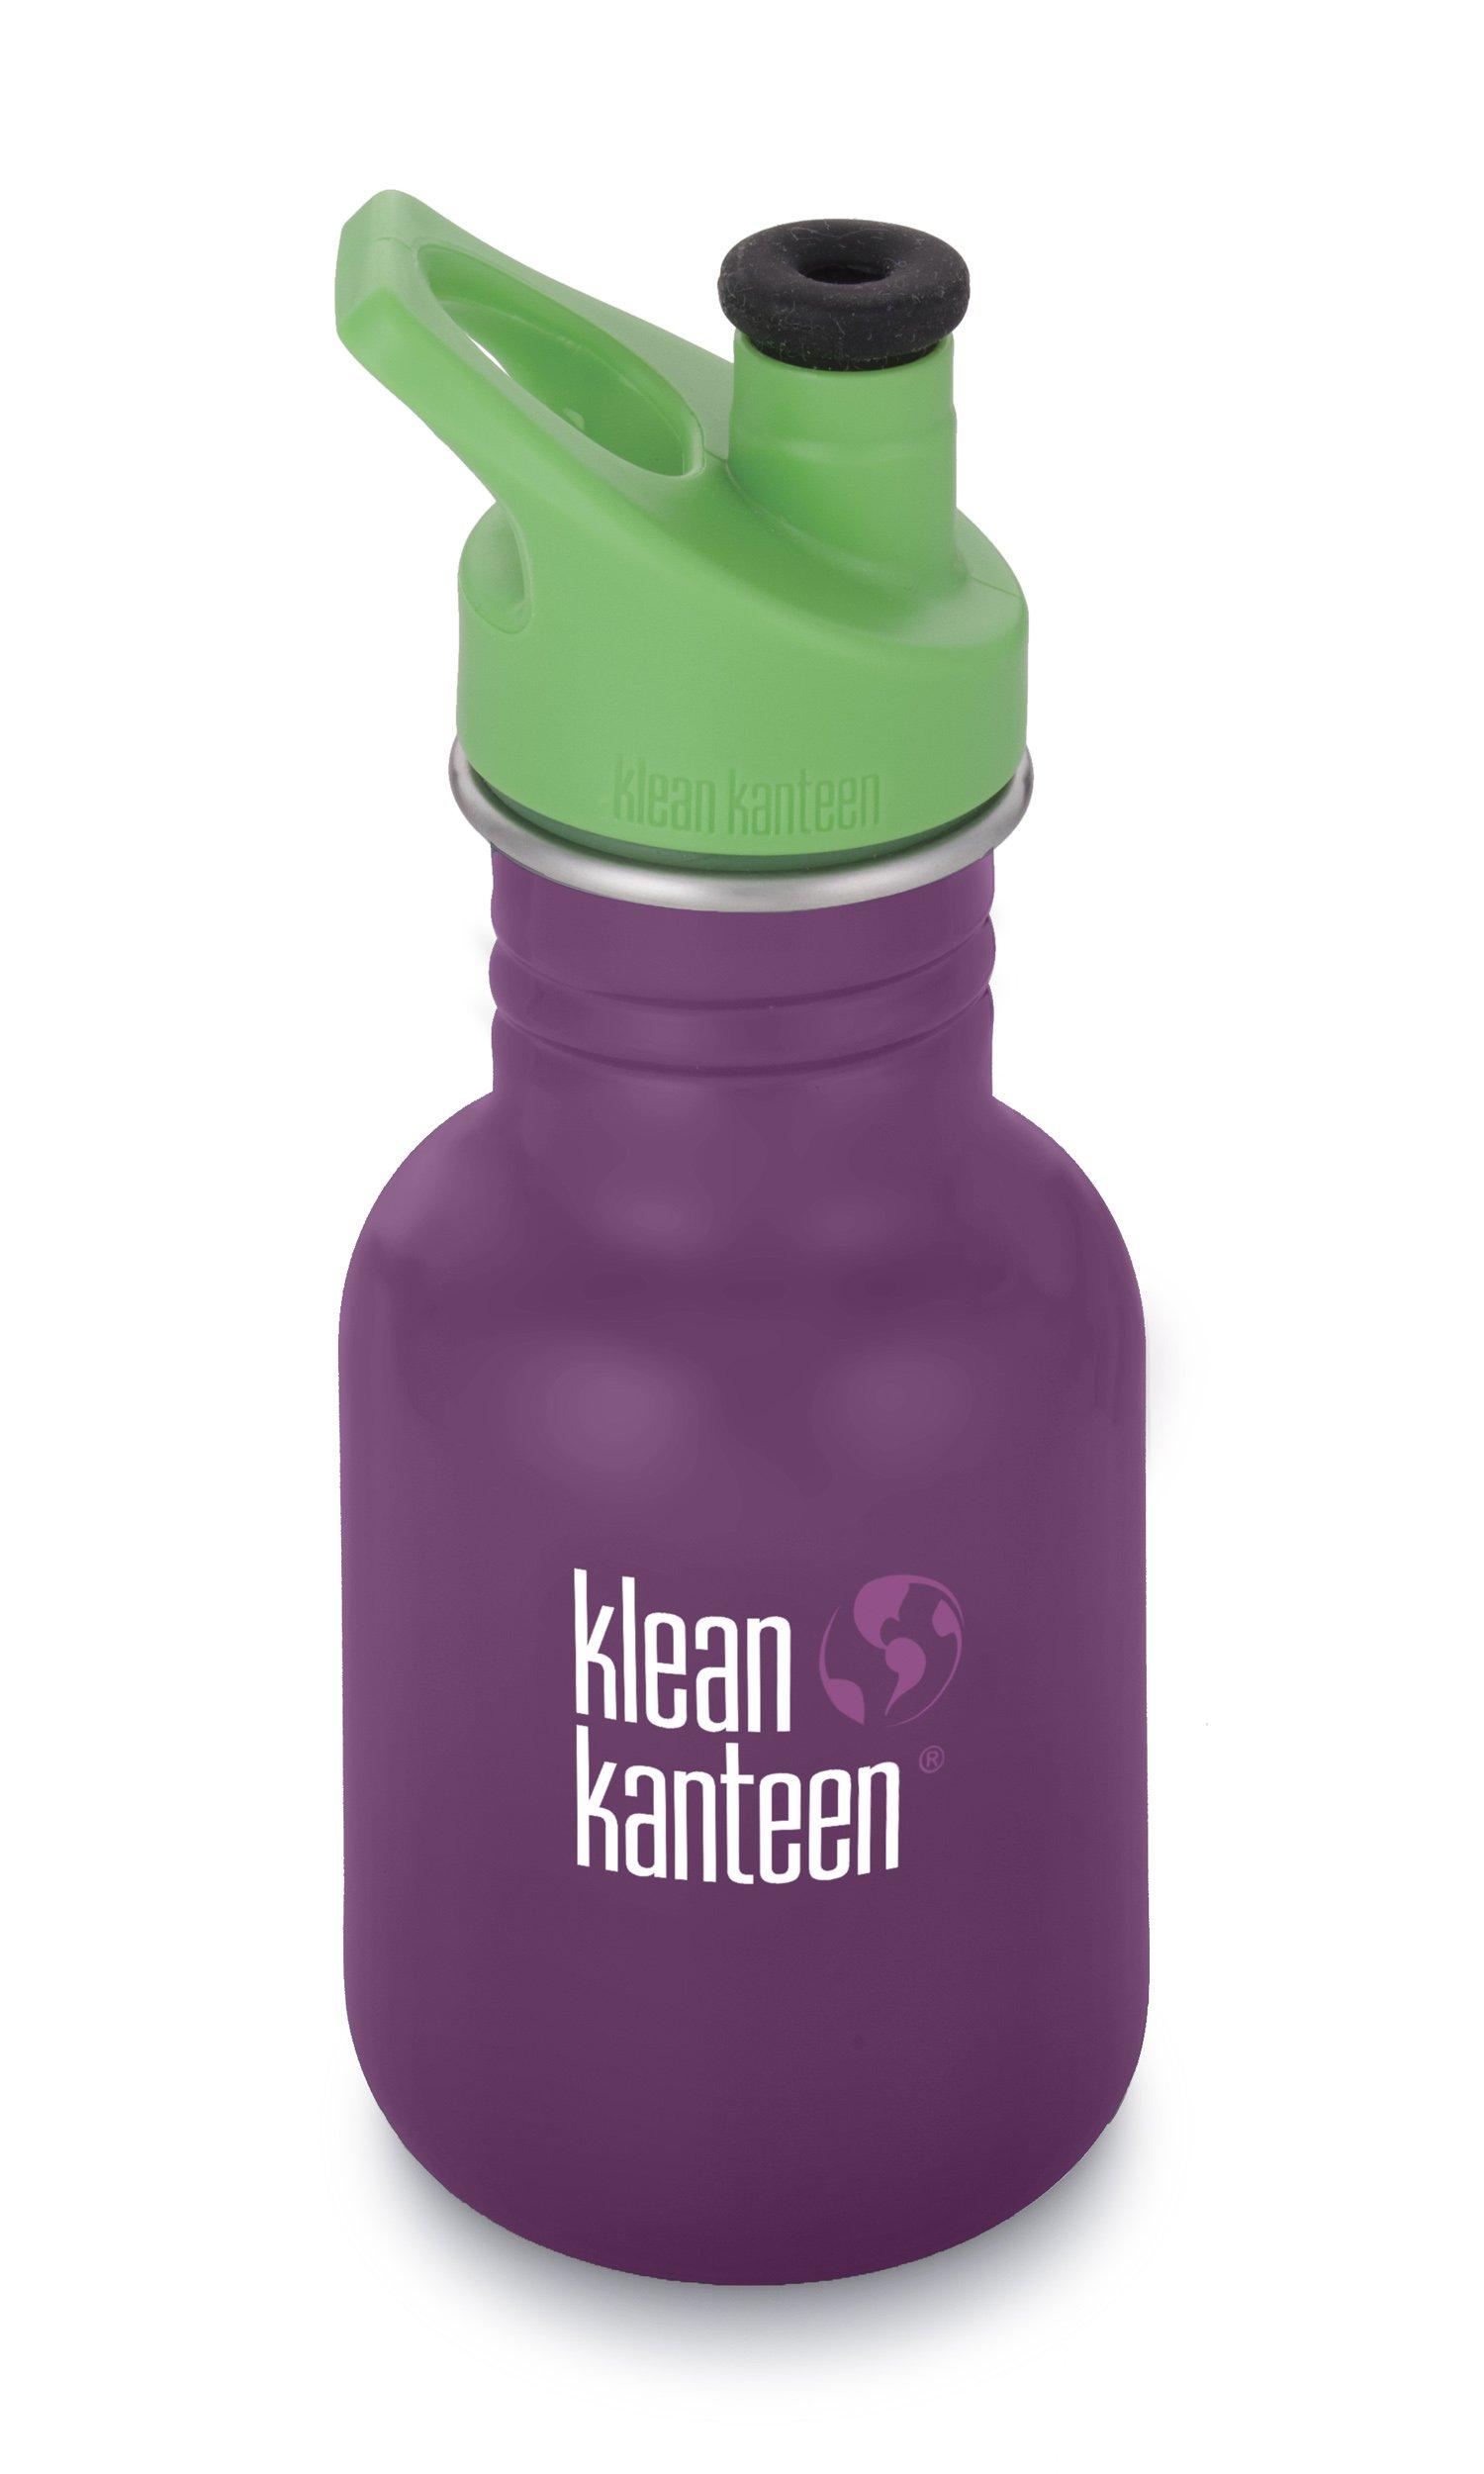 Klean Kanteen Kids Single Wall Stainless Steel Sport Bottle with Klean Coat and Leak Resistant Sport Cap 3.0-12oz - Winter Plum